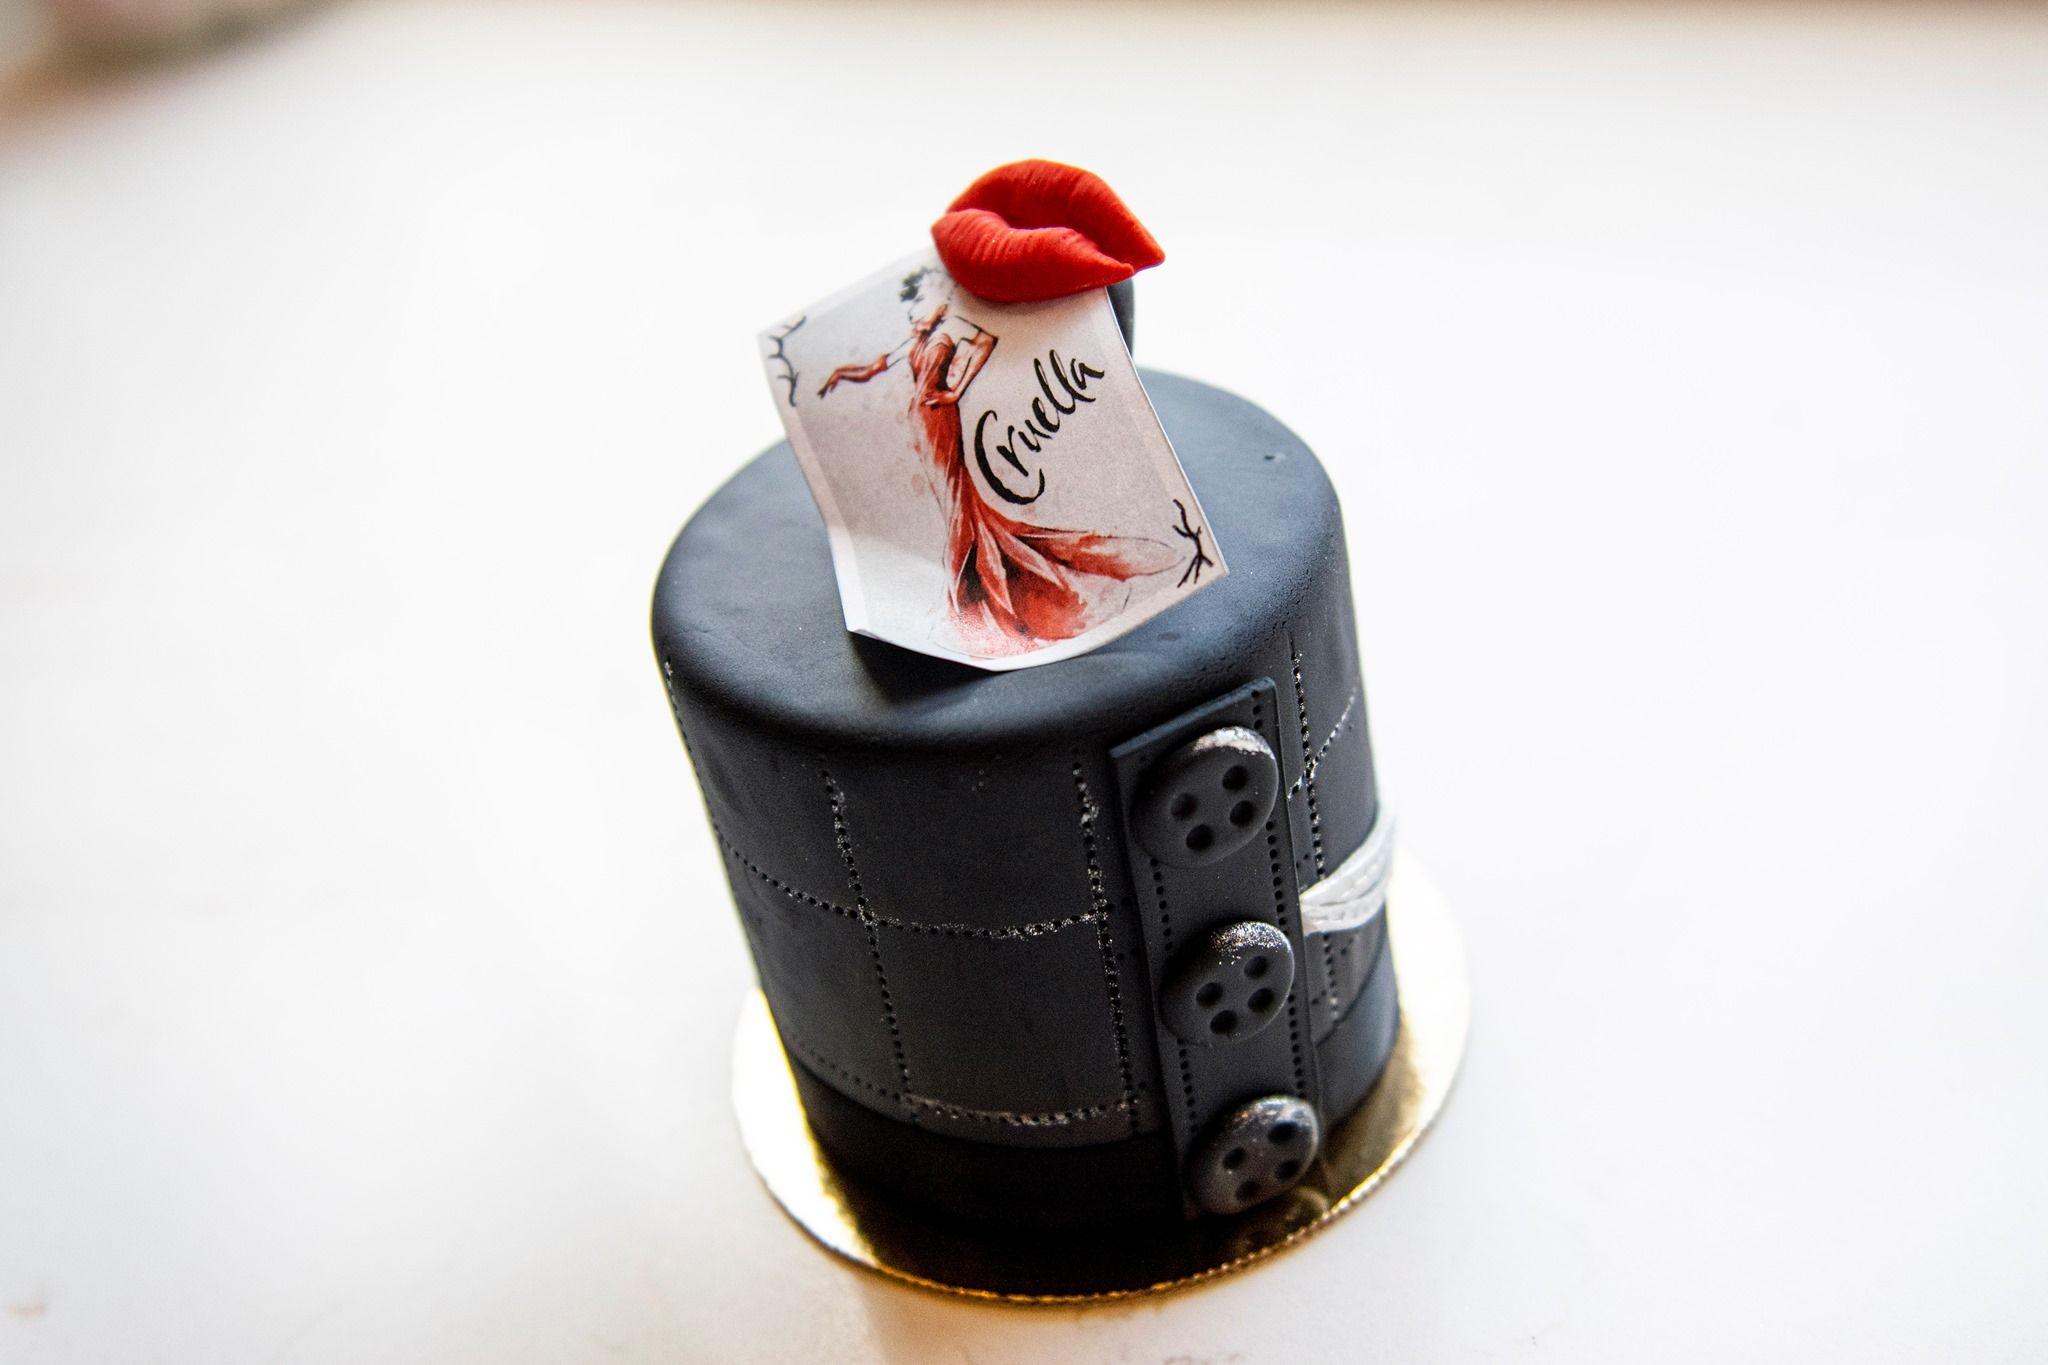 Cruella Petit Cake from Amorette's Patisserie